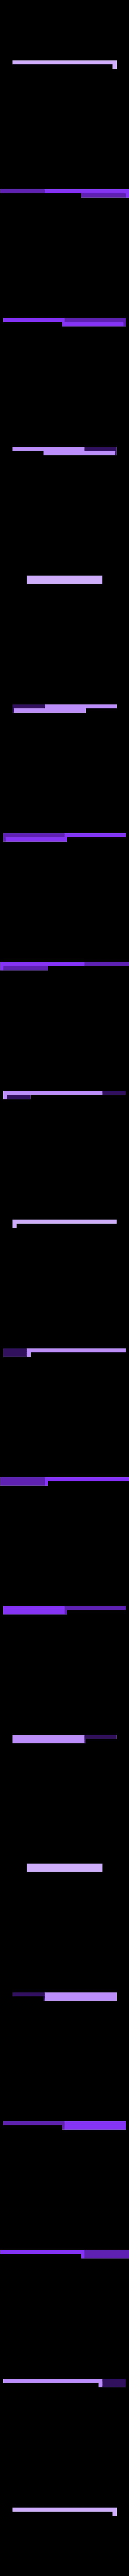 xpi_venthole#r1.stl Download STL file Raspberry Pi 4 case XPI • 3D printing template, Steenberg